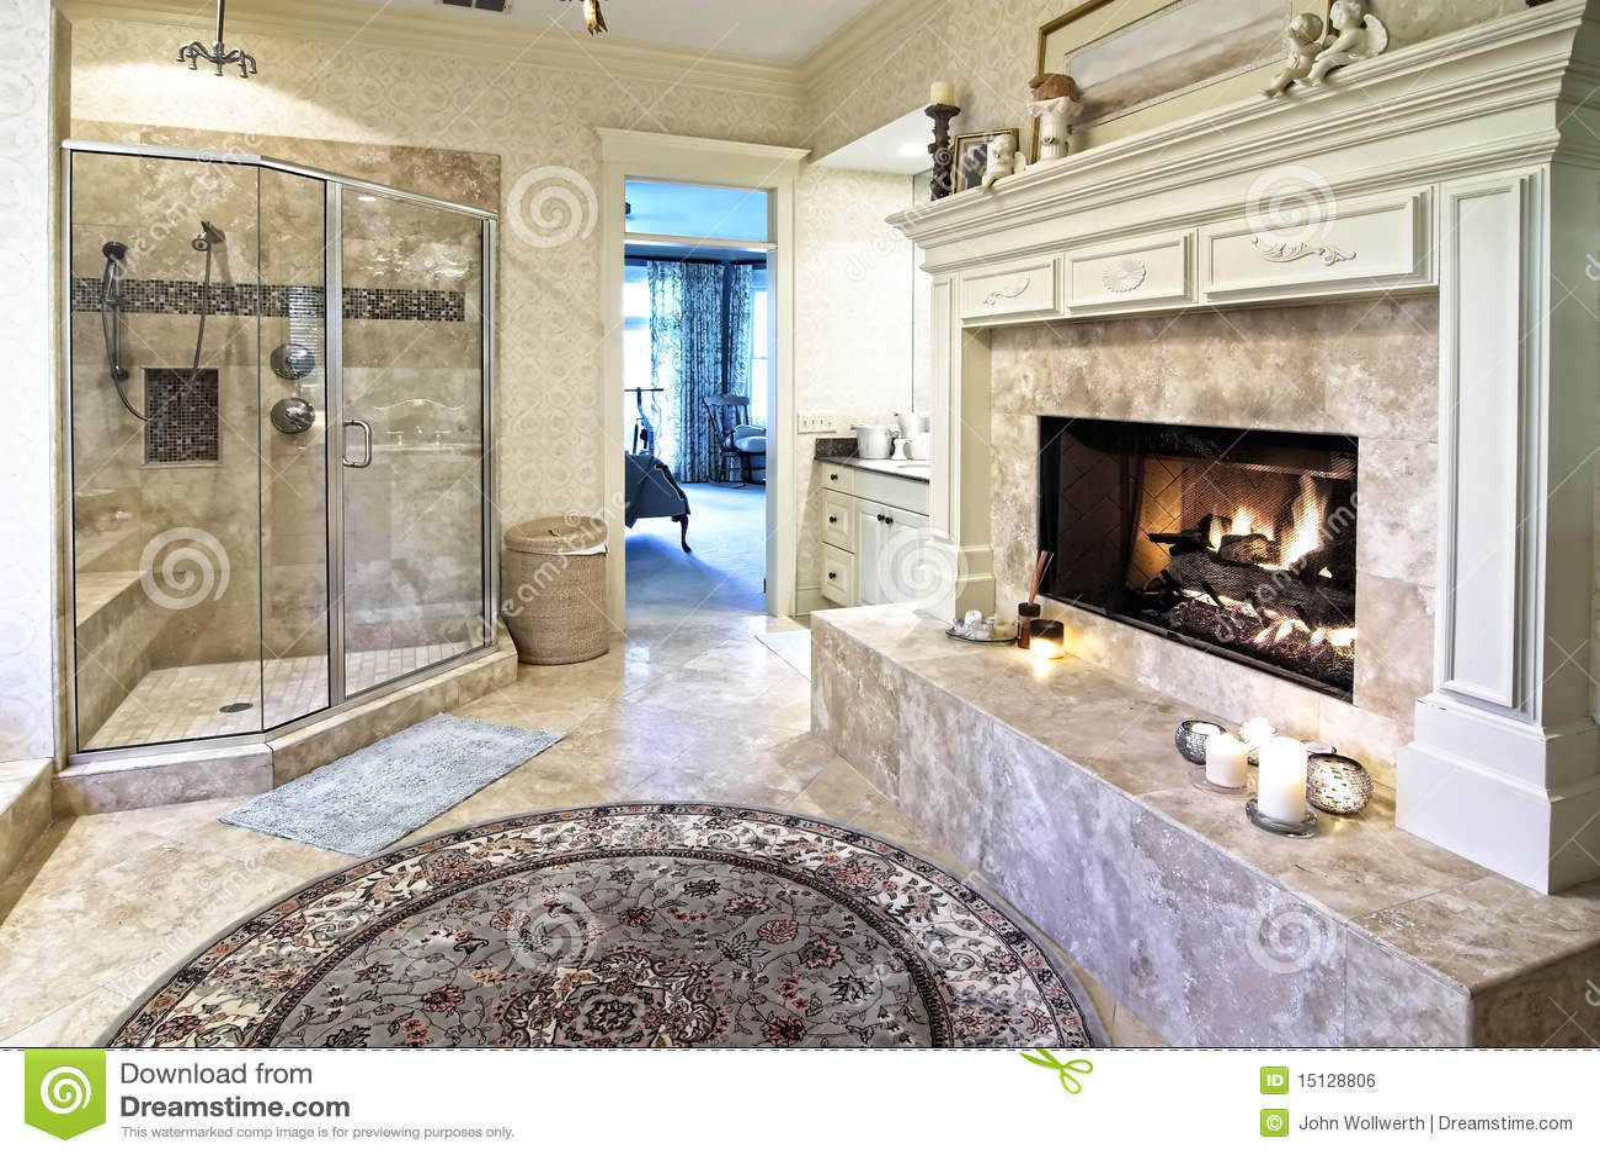 Opulent Bathroom 50 Stock Photo Image Of Lavish Opulent